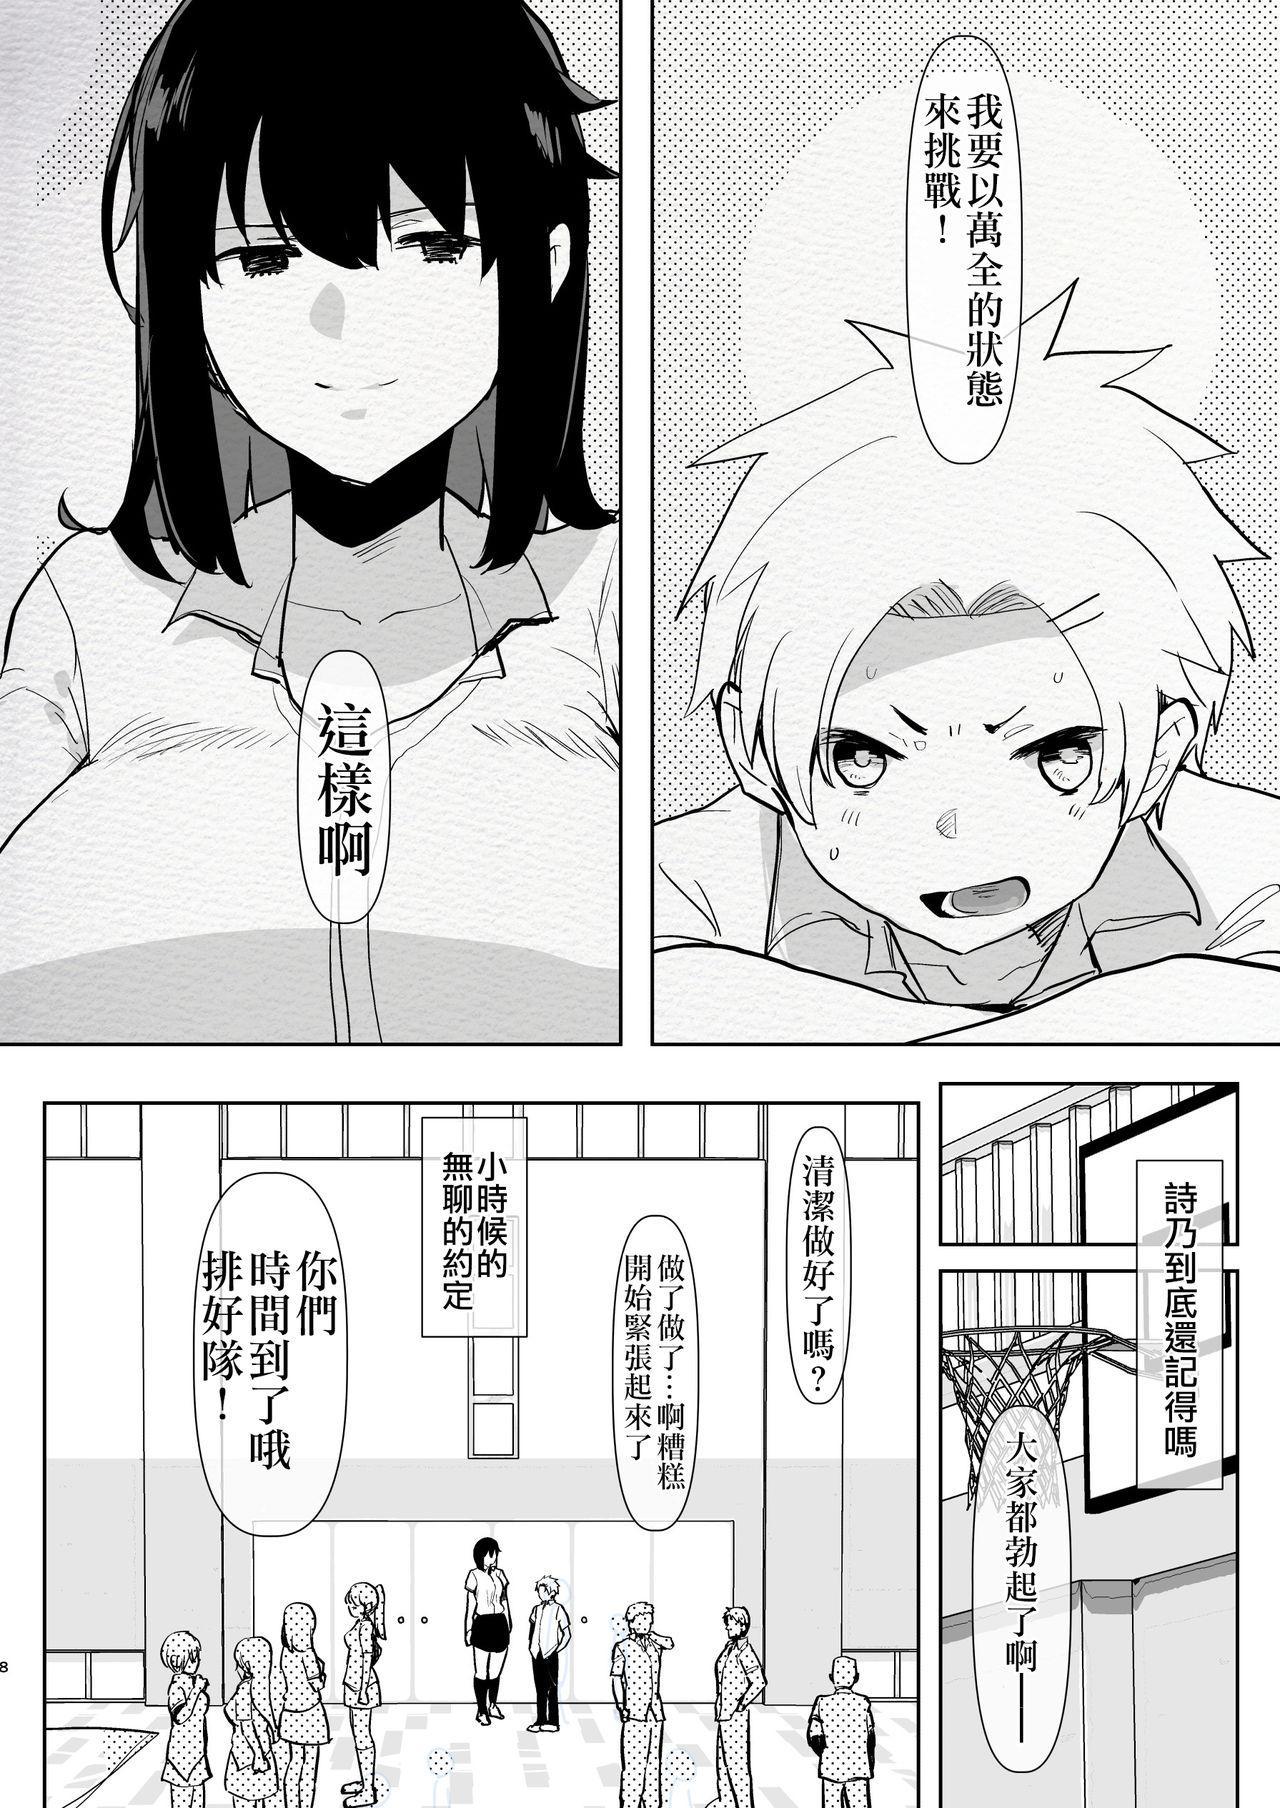 Futanari Osananajimi to Ore to Hajimete no Gyaku Anal Kagai Jugyou 丨扶她青梅竹馬和我第一次的反向小穴做愛課外授課 8